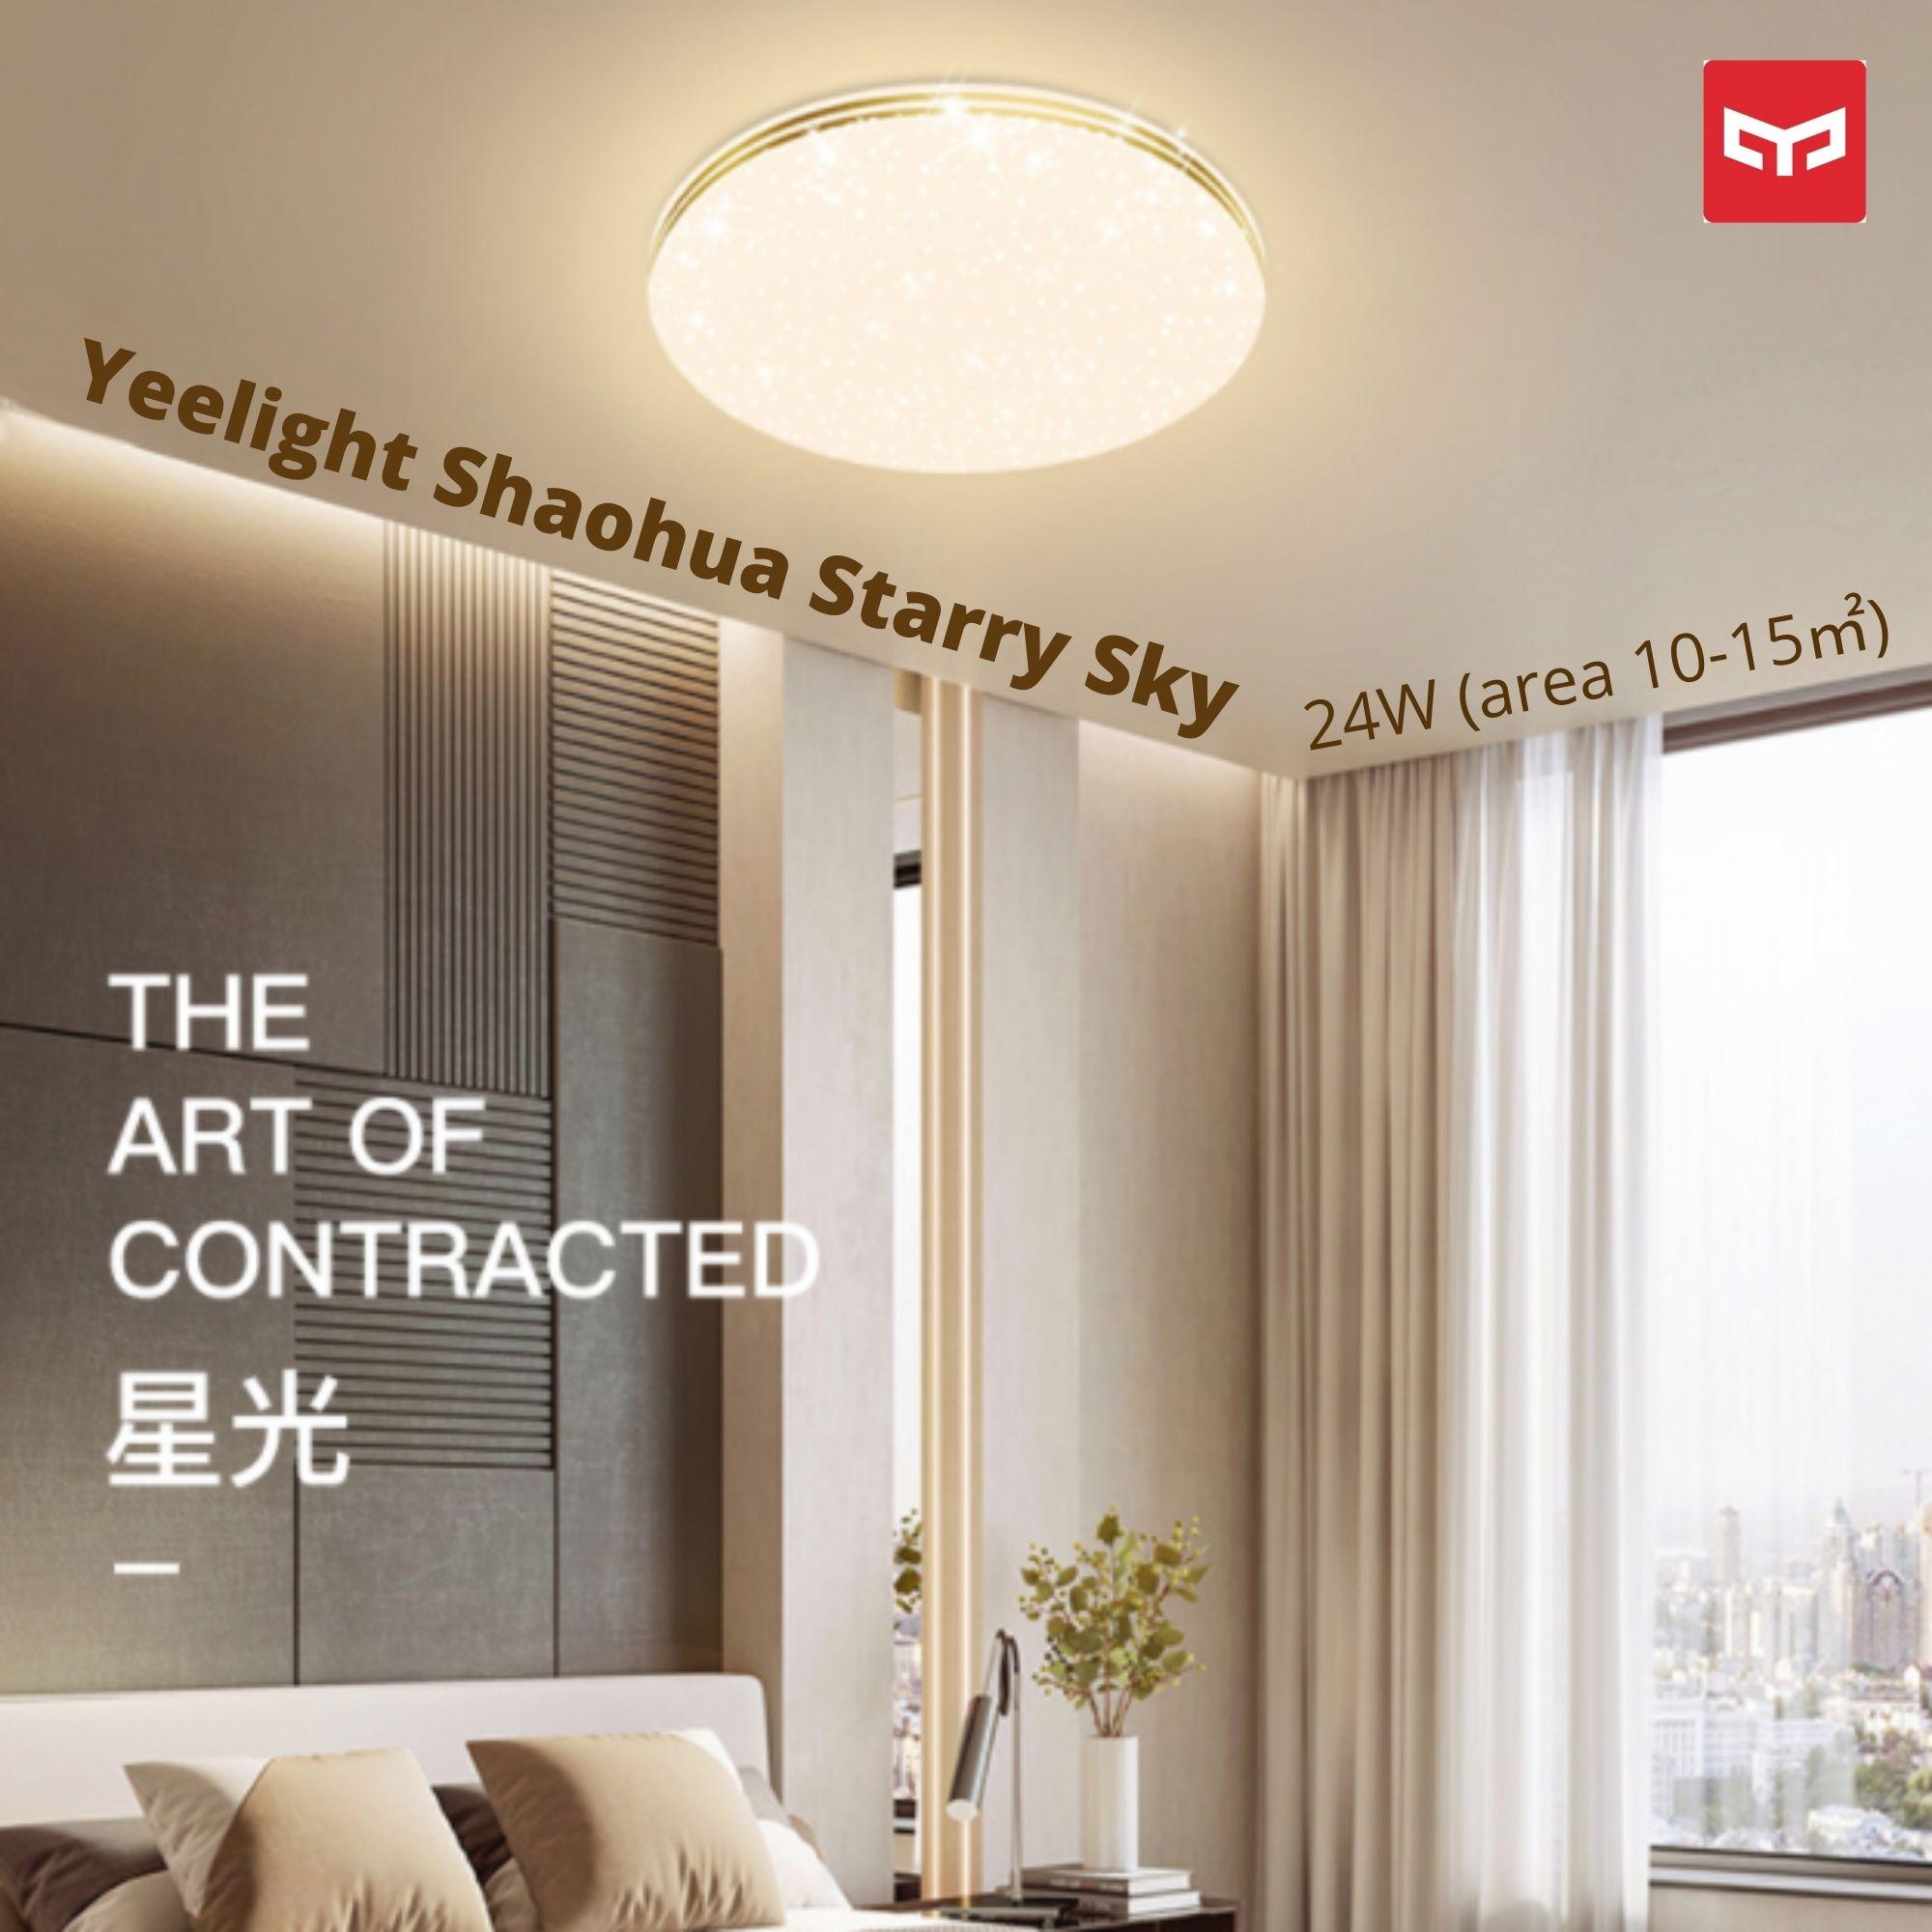 Đèn ốp trần Yeelight Shaohua 420 Ánh Sao